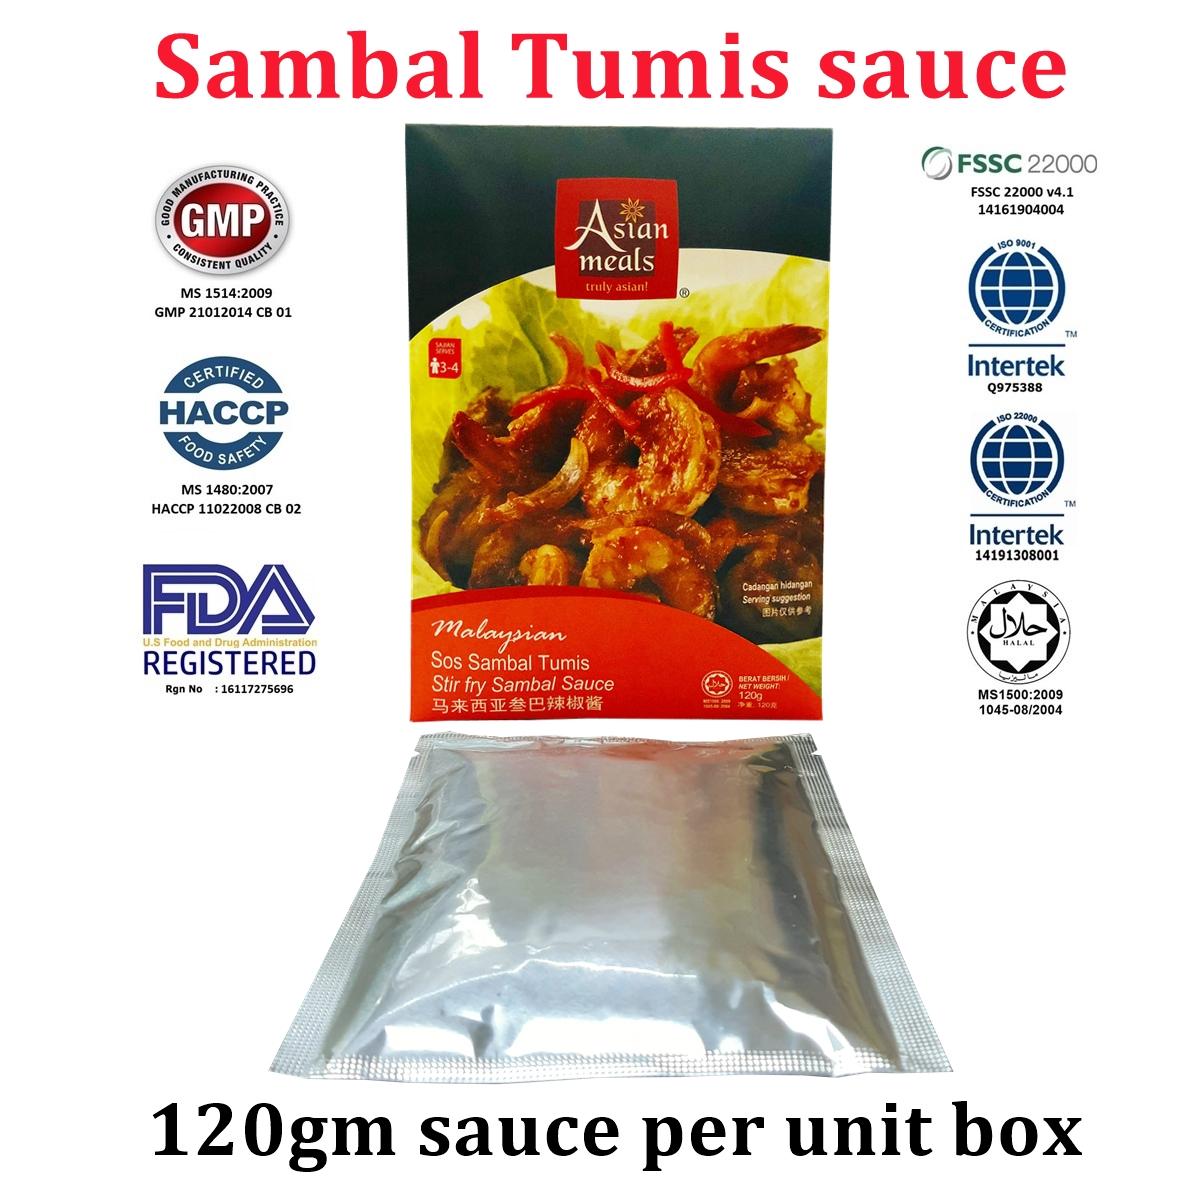 AsianMeals® Sambal Tumis sauce 120gm